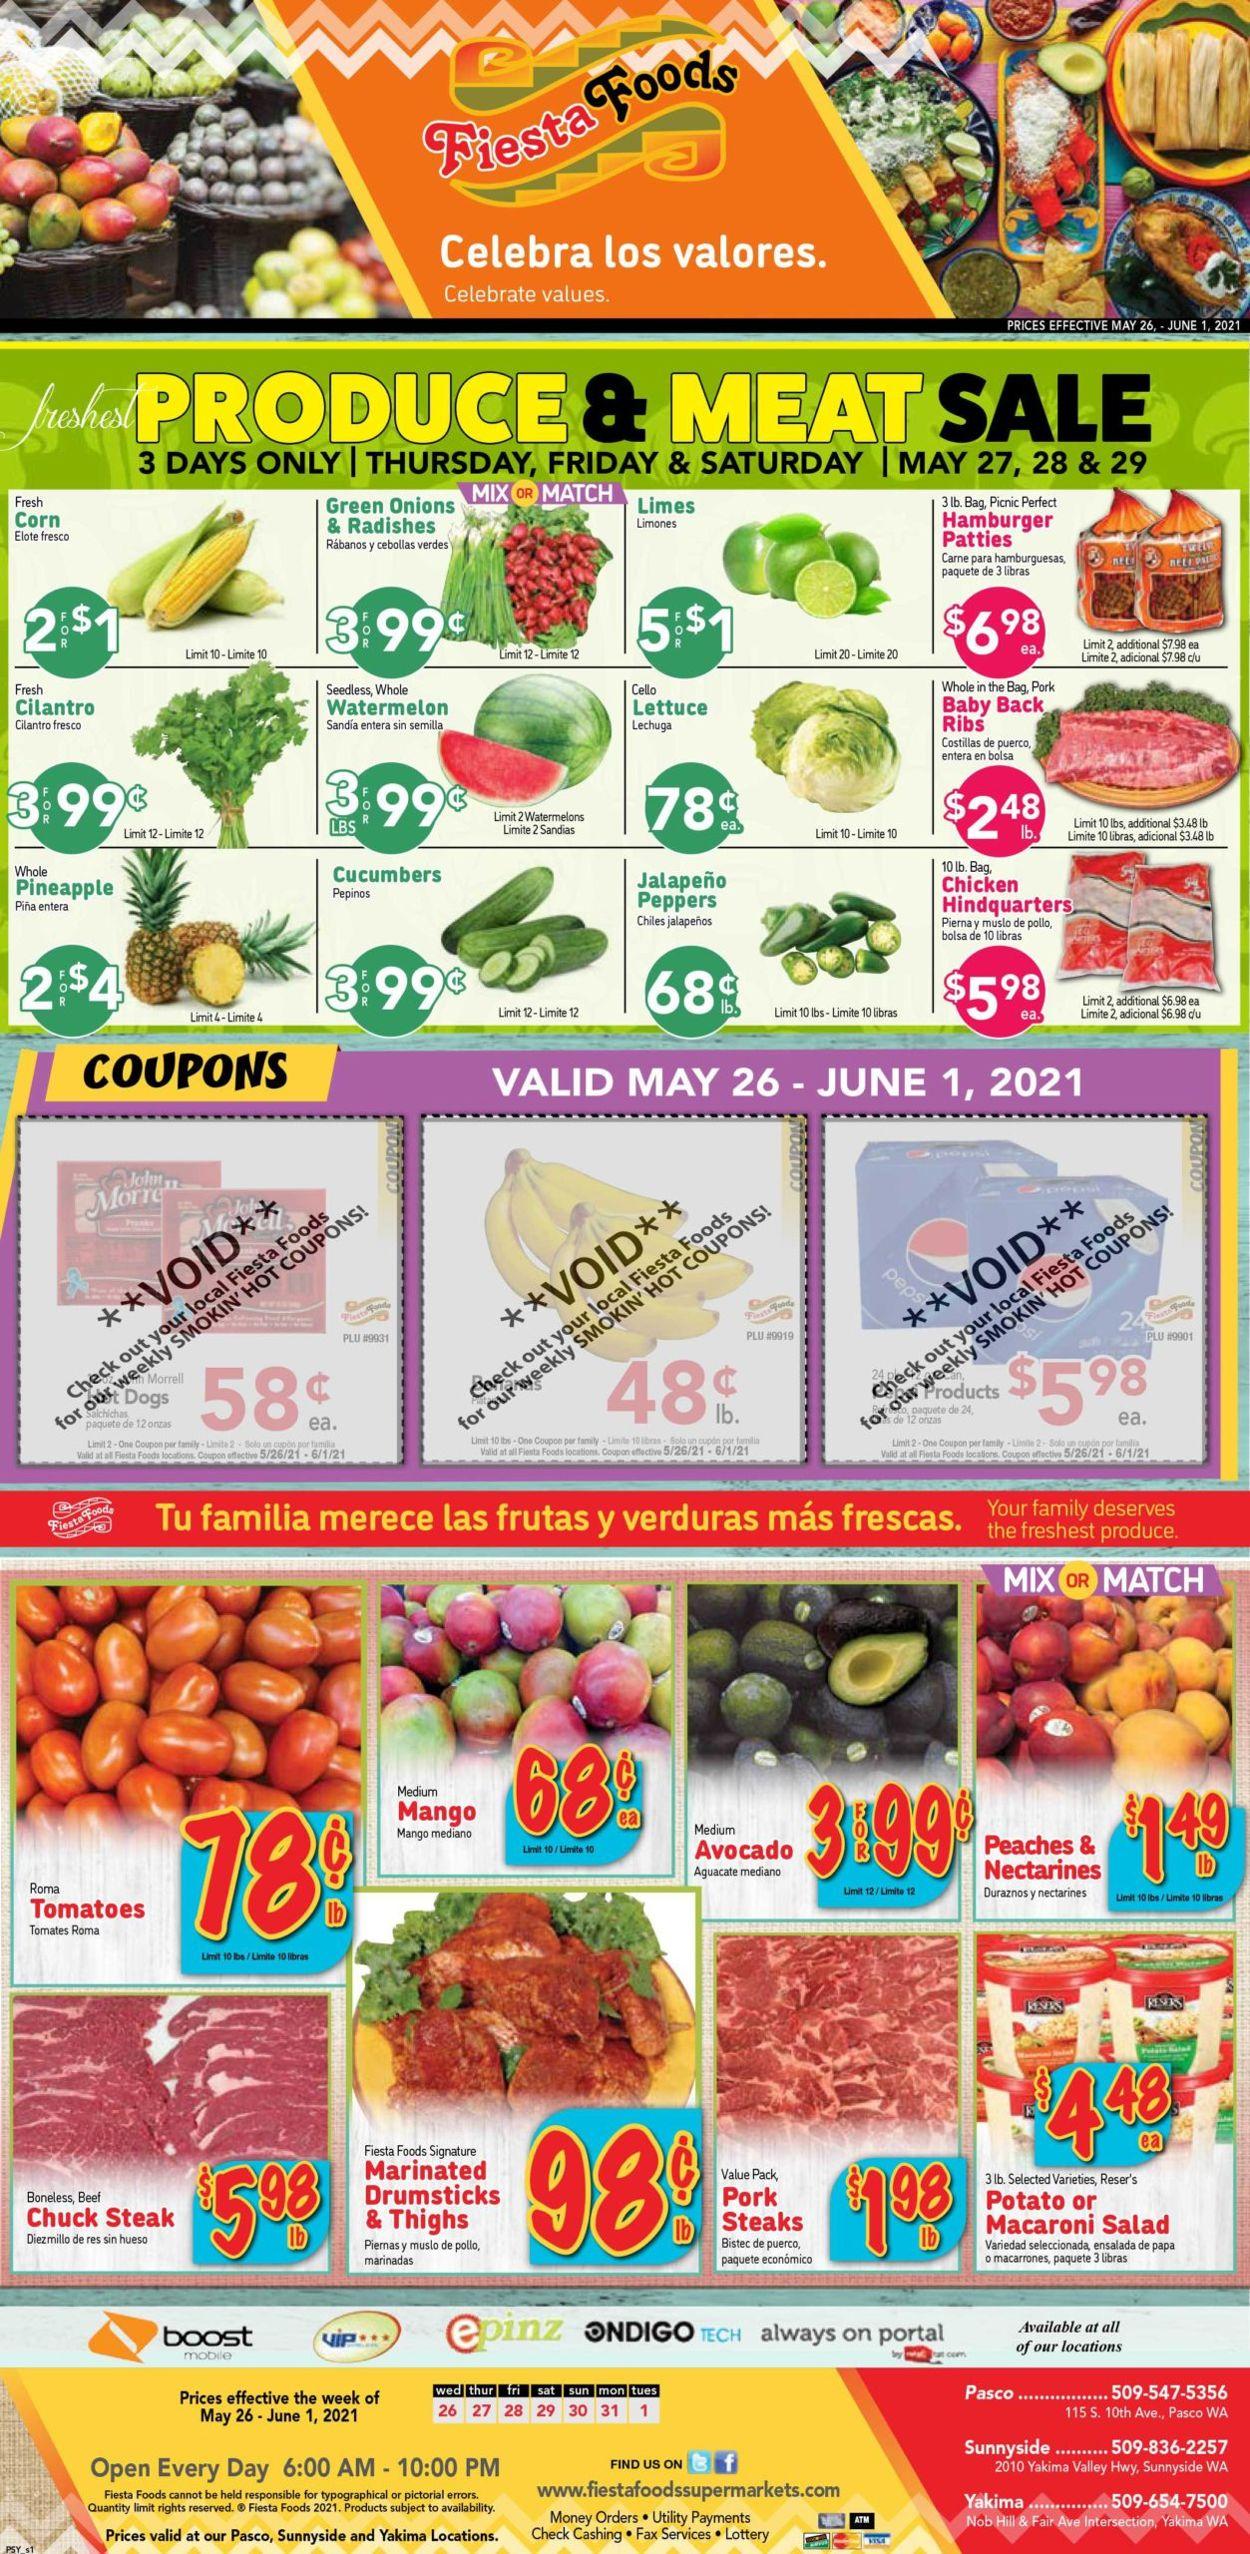 Fiesta Foods SuperMarkets Weekly Ad Circular - valid 05/26-06/01/2021